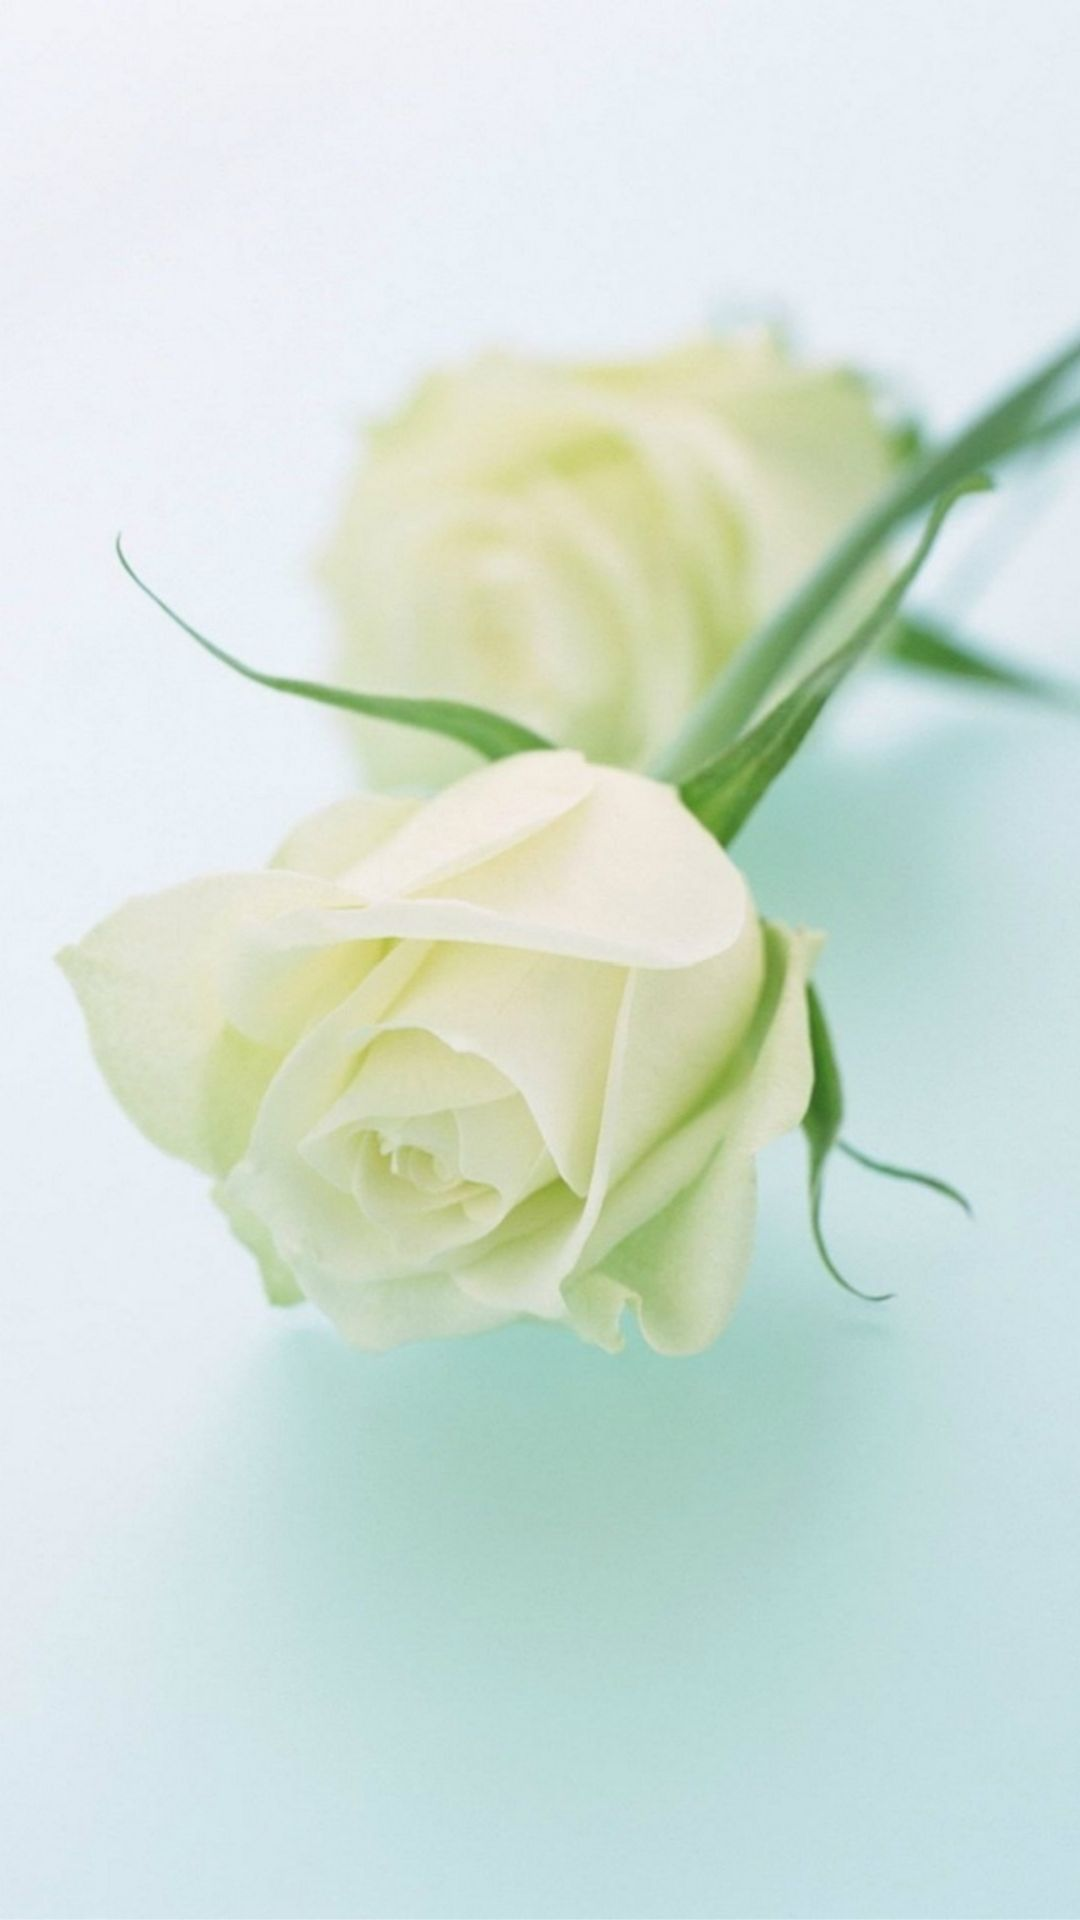 Pure Elegant White Rose Plant Branch Iphone 6 Wallpaper Download Iphone Wallpapers Ipad Wallpapers One Stop D White Rose Flower White Rose Plant White Roses